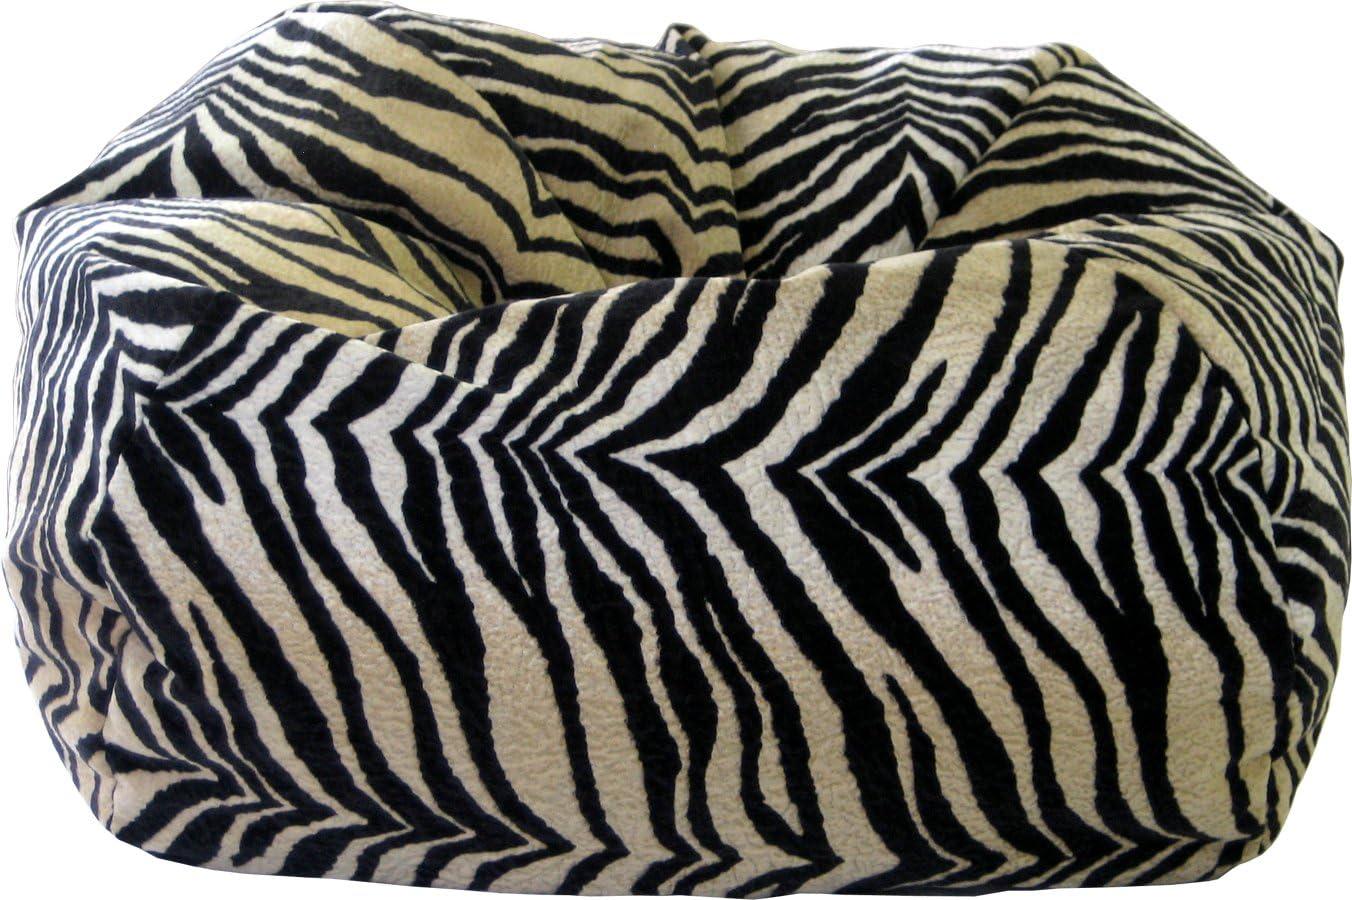 Gold Medal Bean Bags Medium Suede Beanbag, Tween Size, Bengali Tiger Print